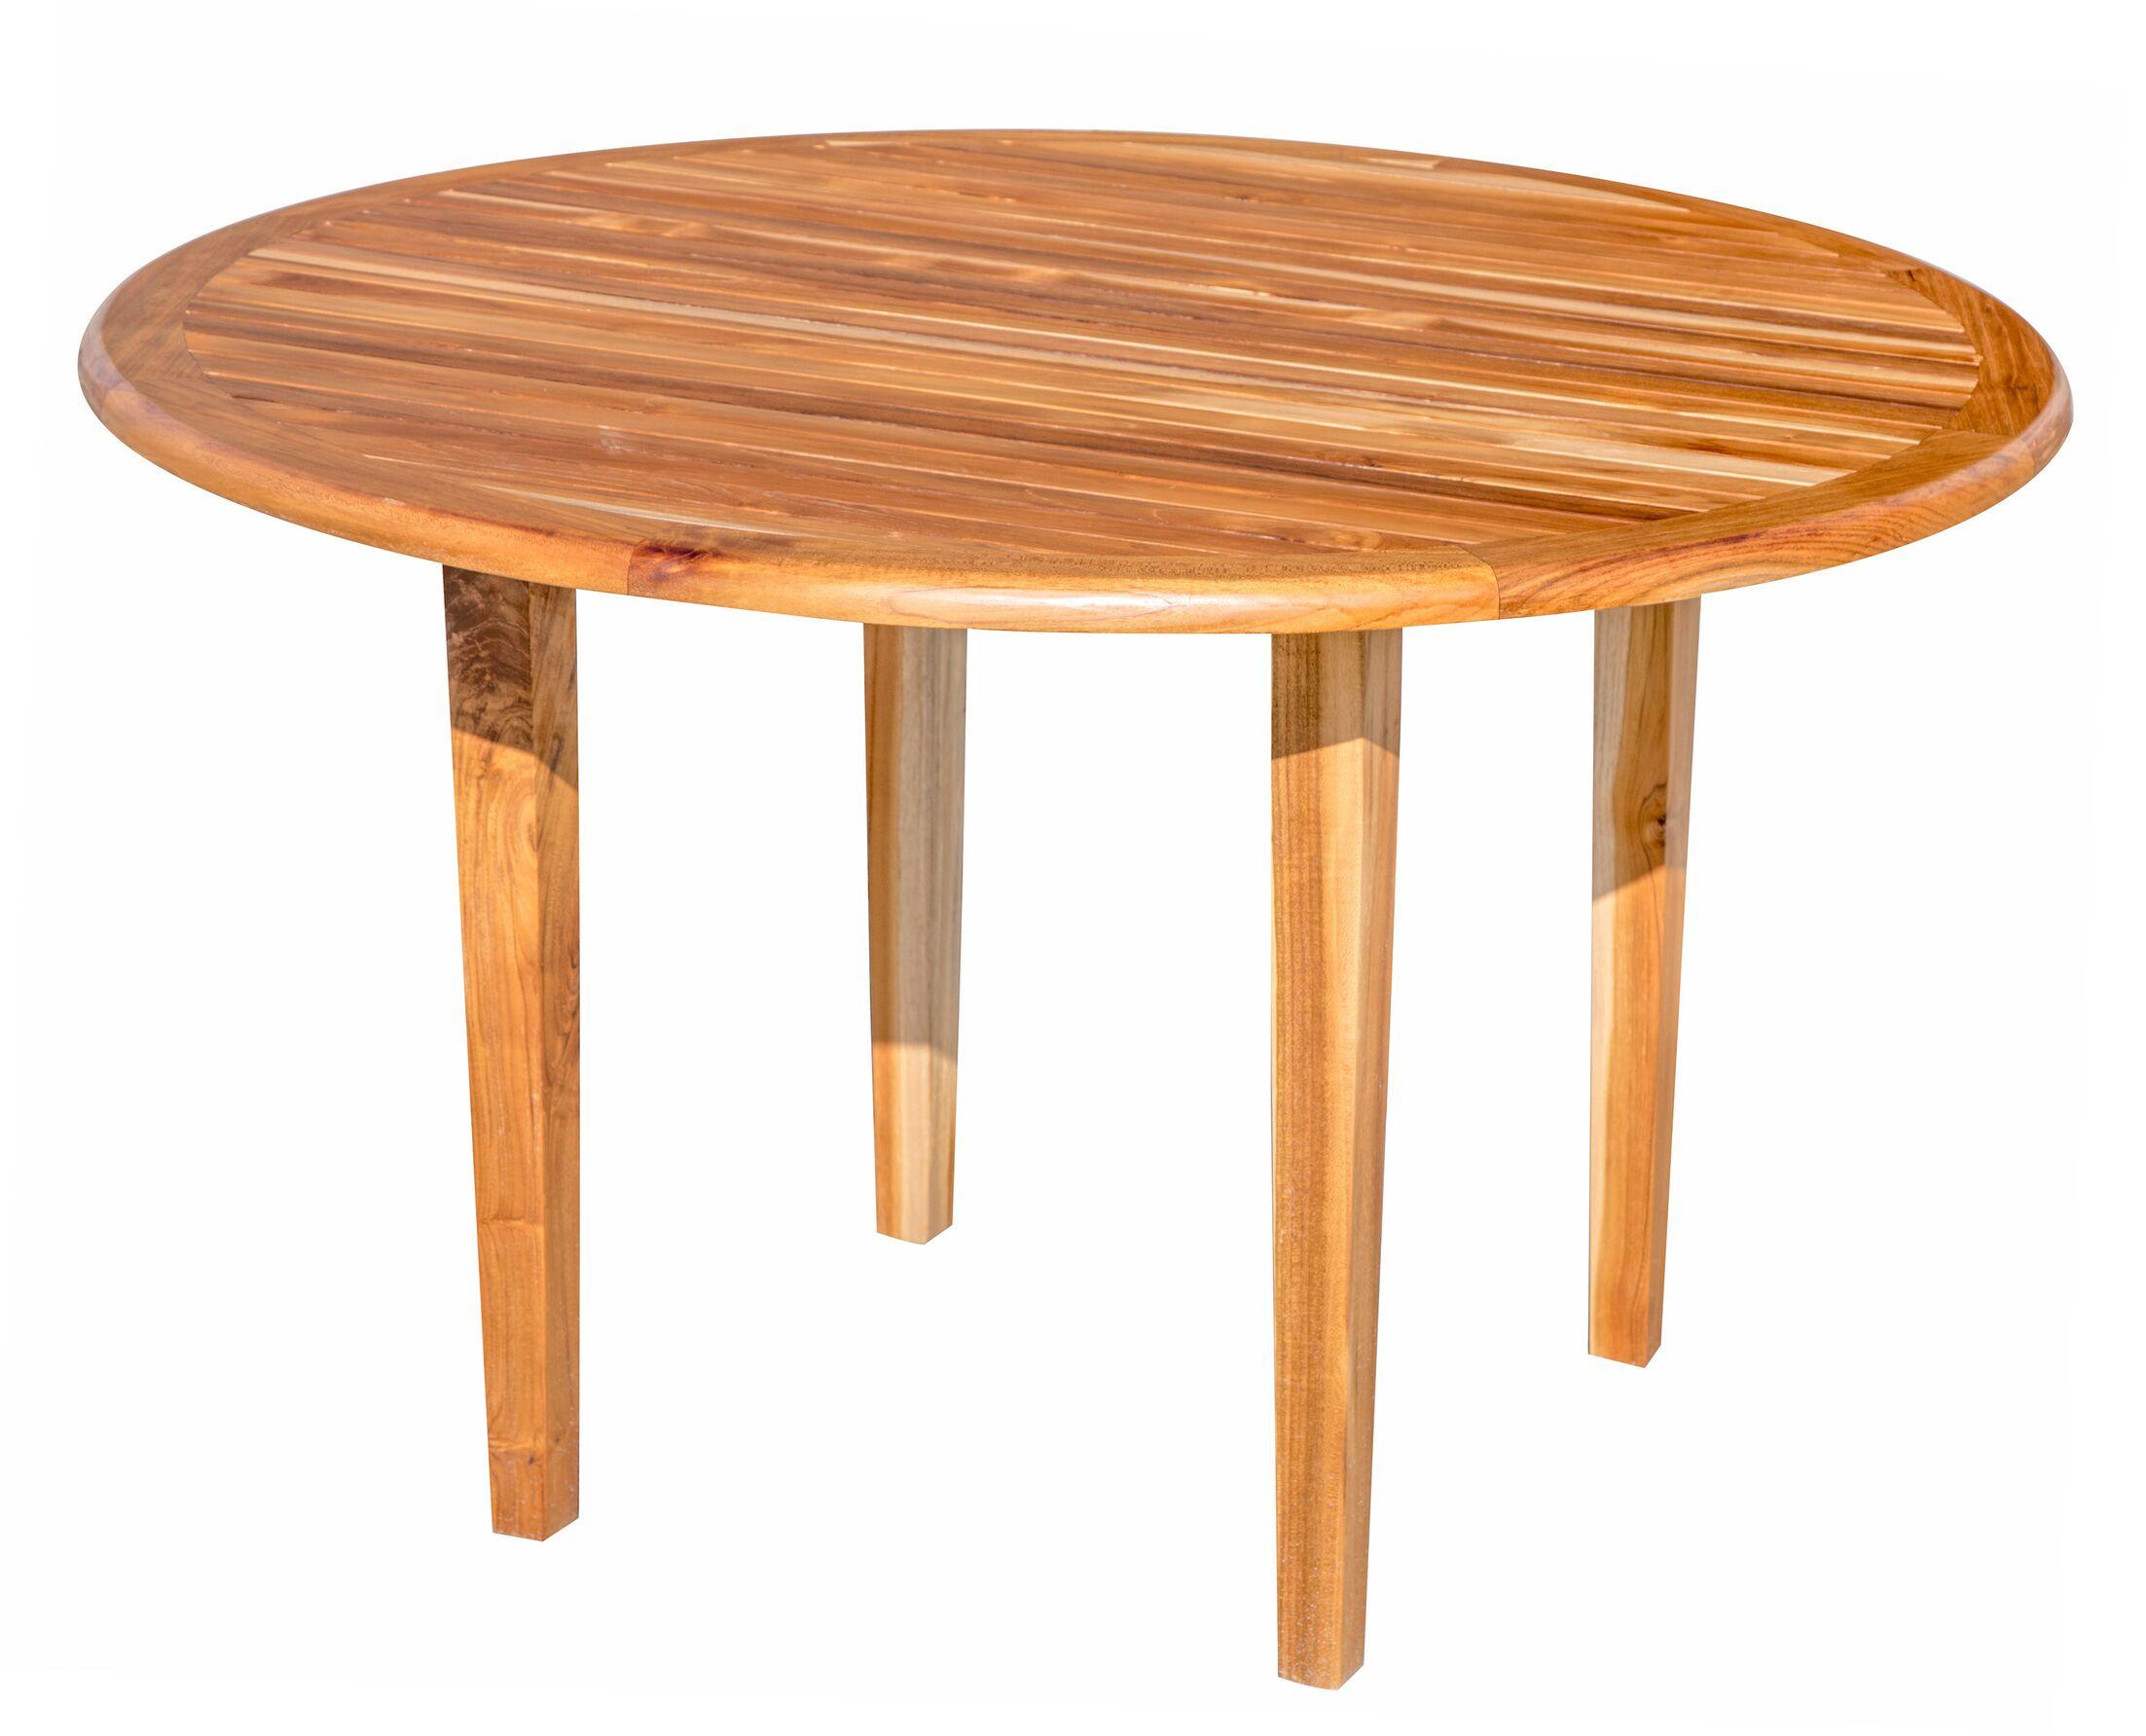 Oasis Teak Dining Table Table Height: 48